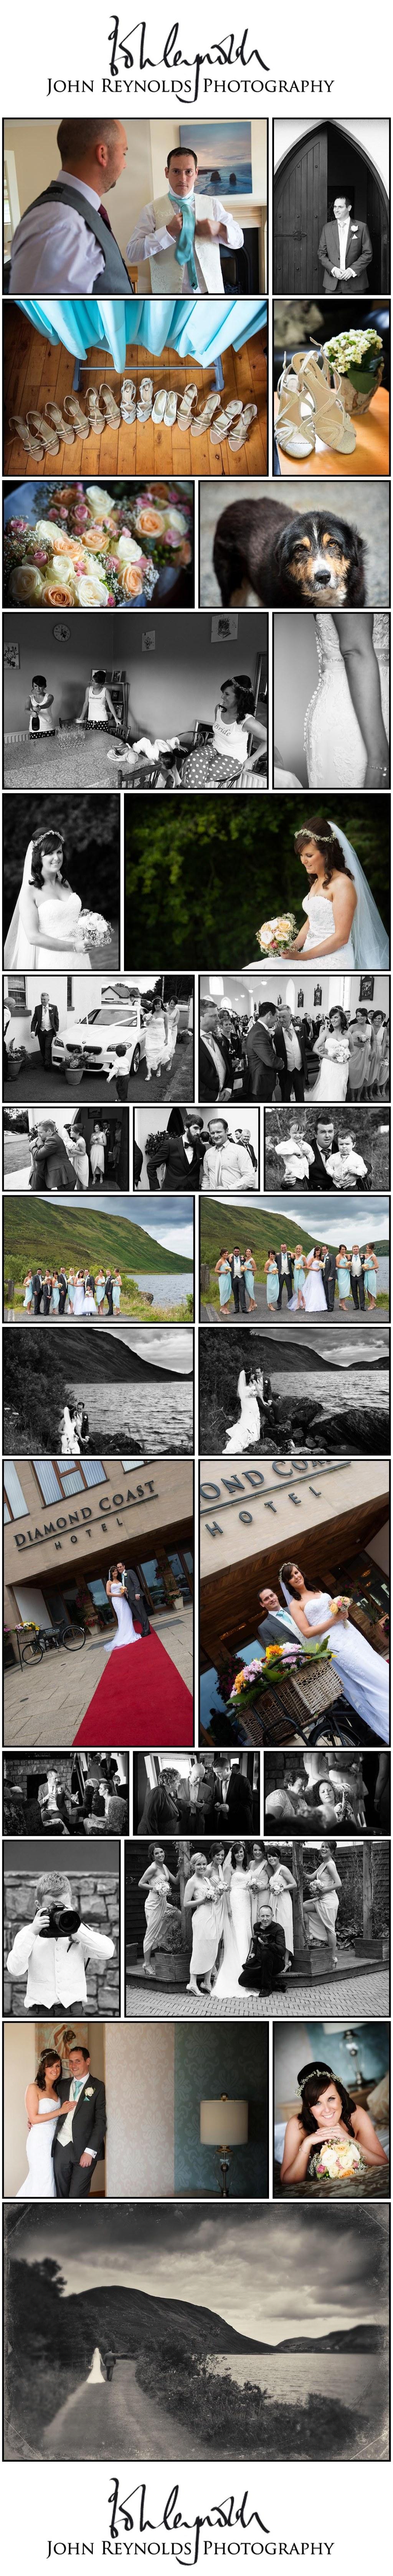 Blog Collage-Audrey & Lee